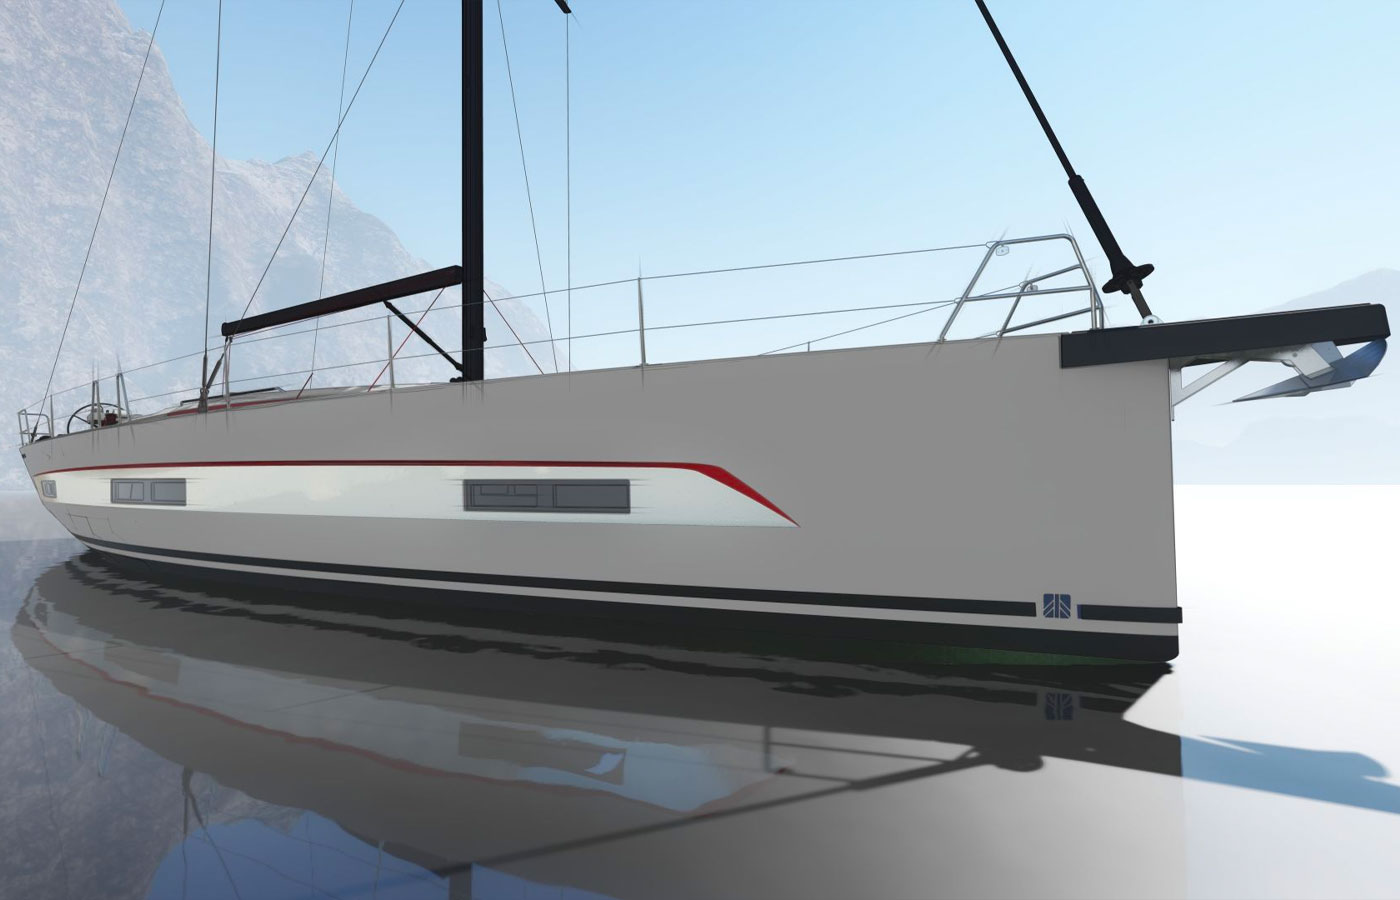 Dufour Announces Launch Of New Dufour 530 [Sailboat Highlight]